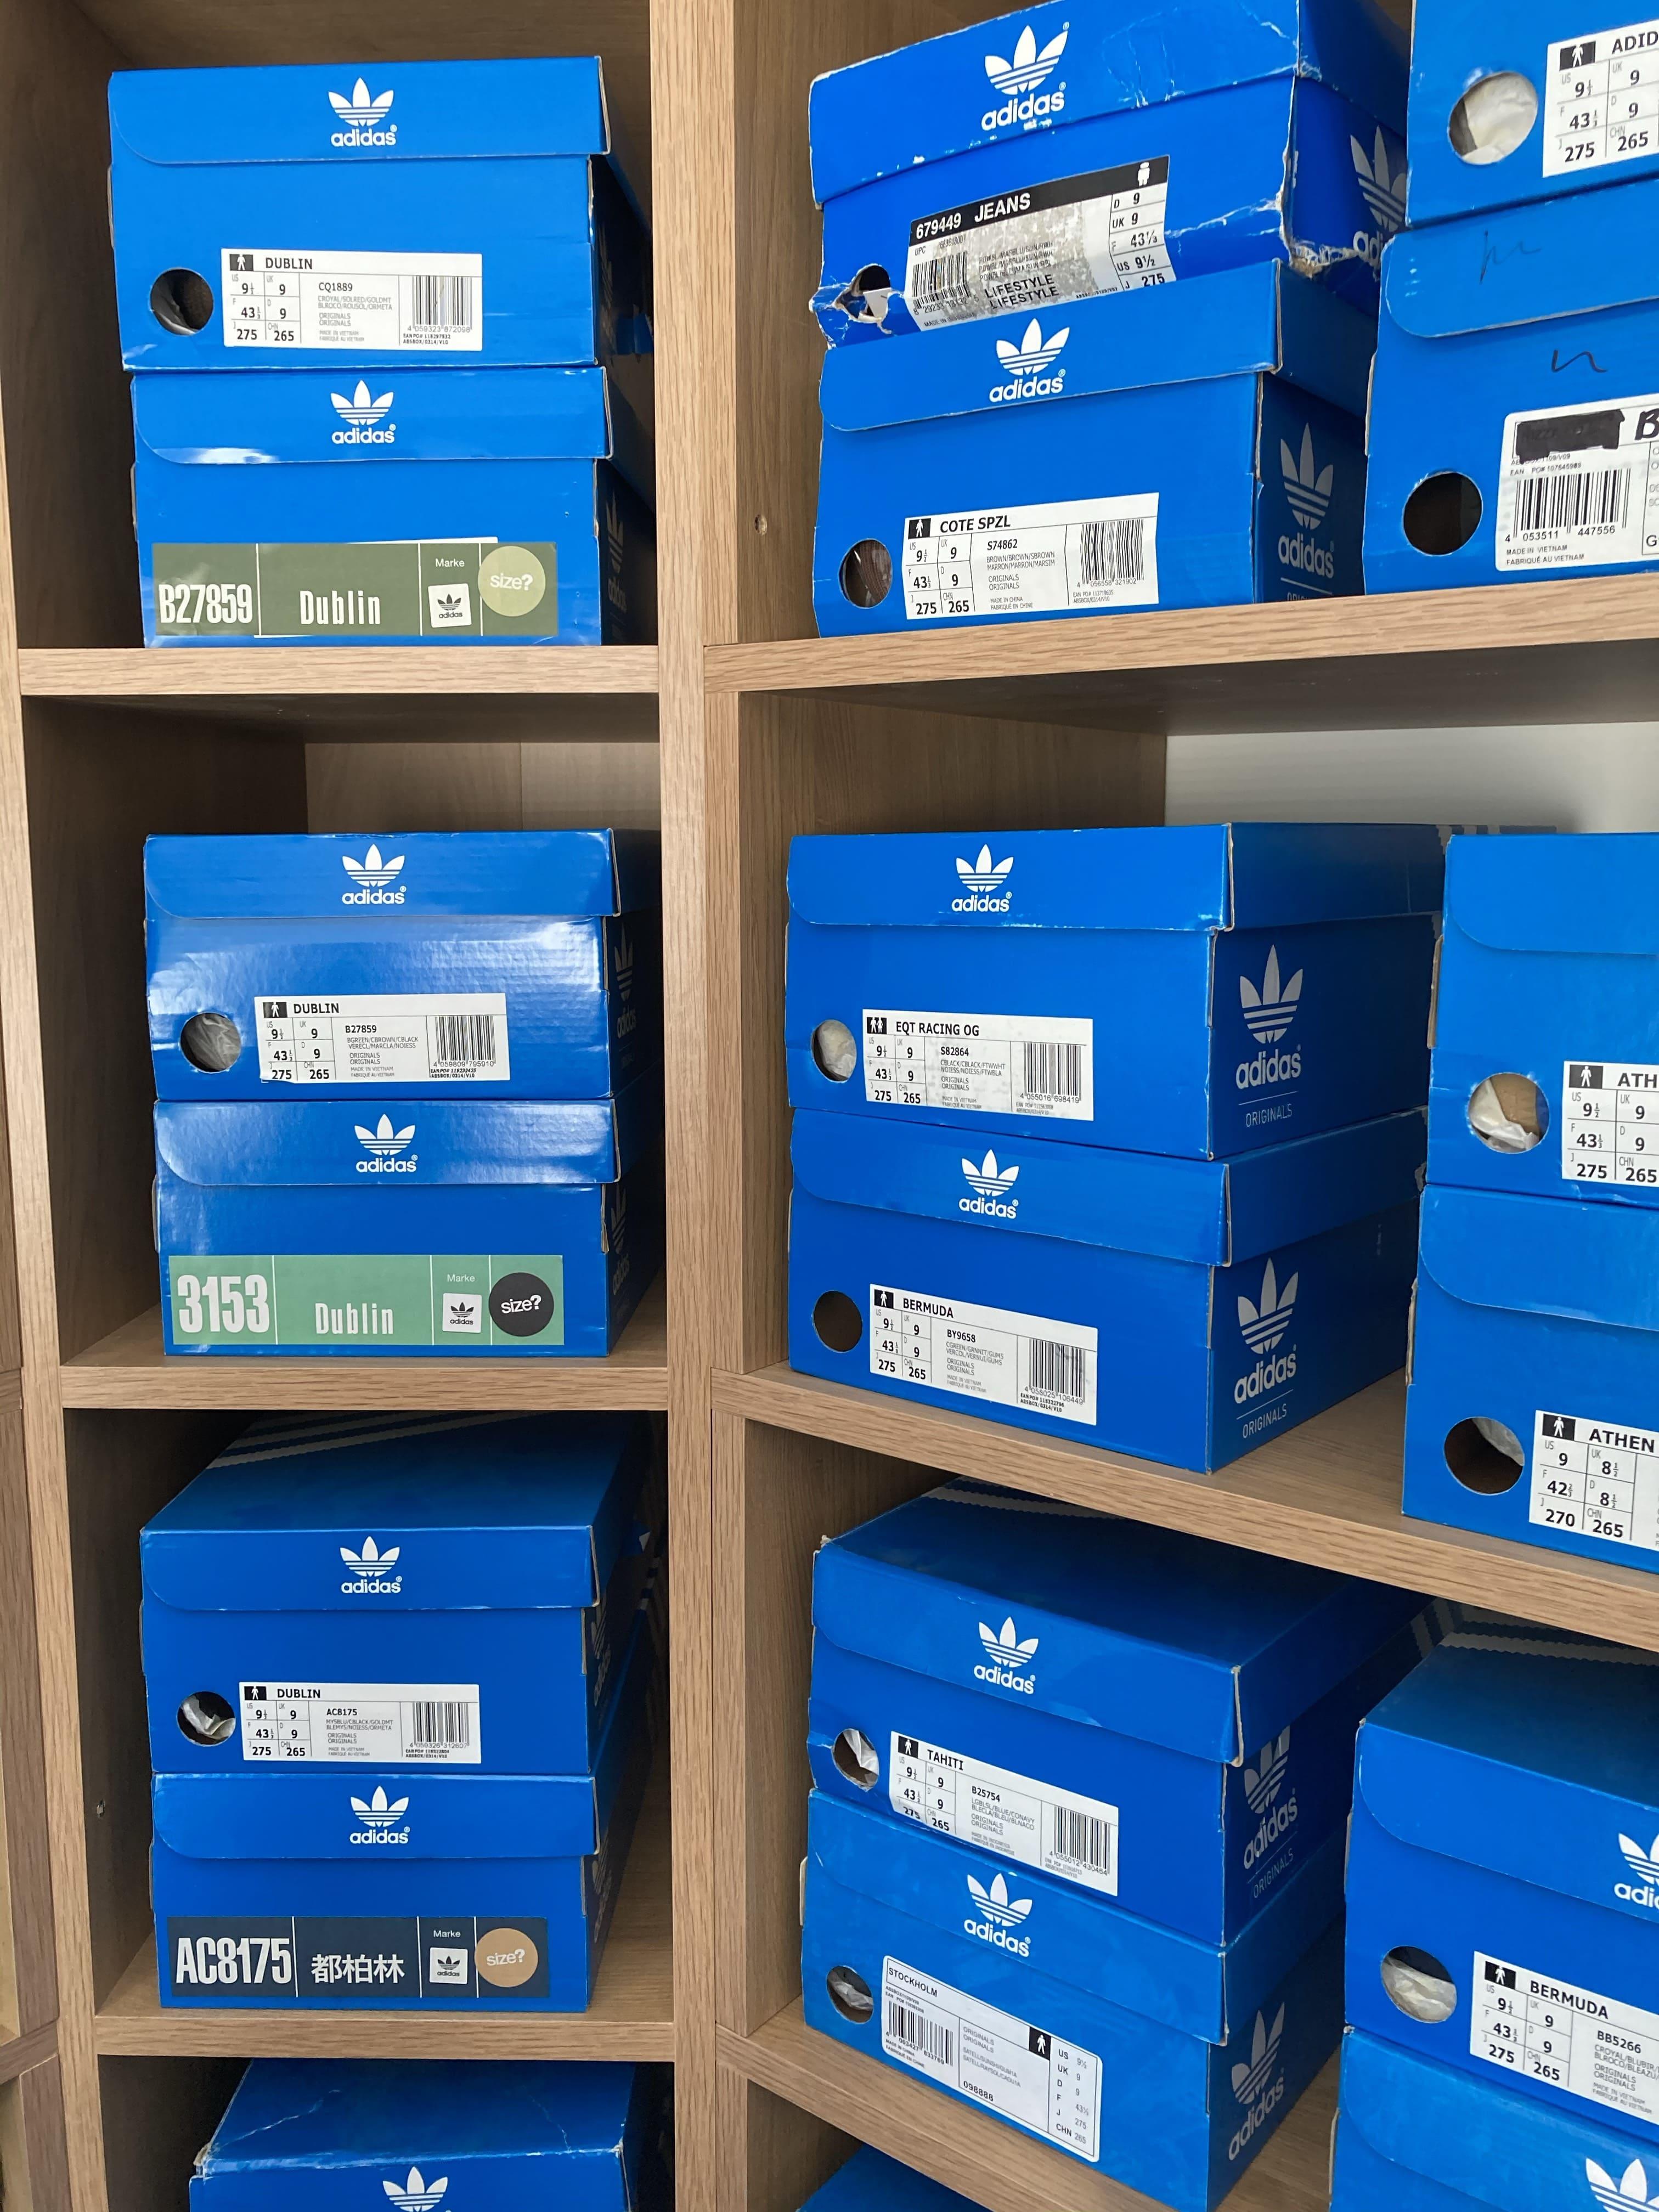 adidas Originals Dublin boxes